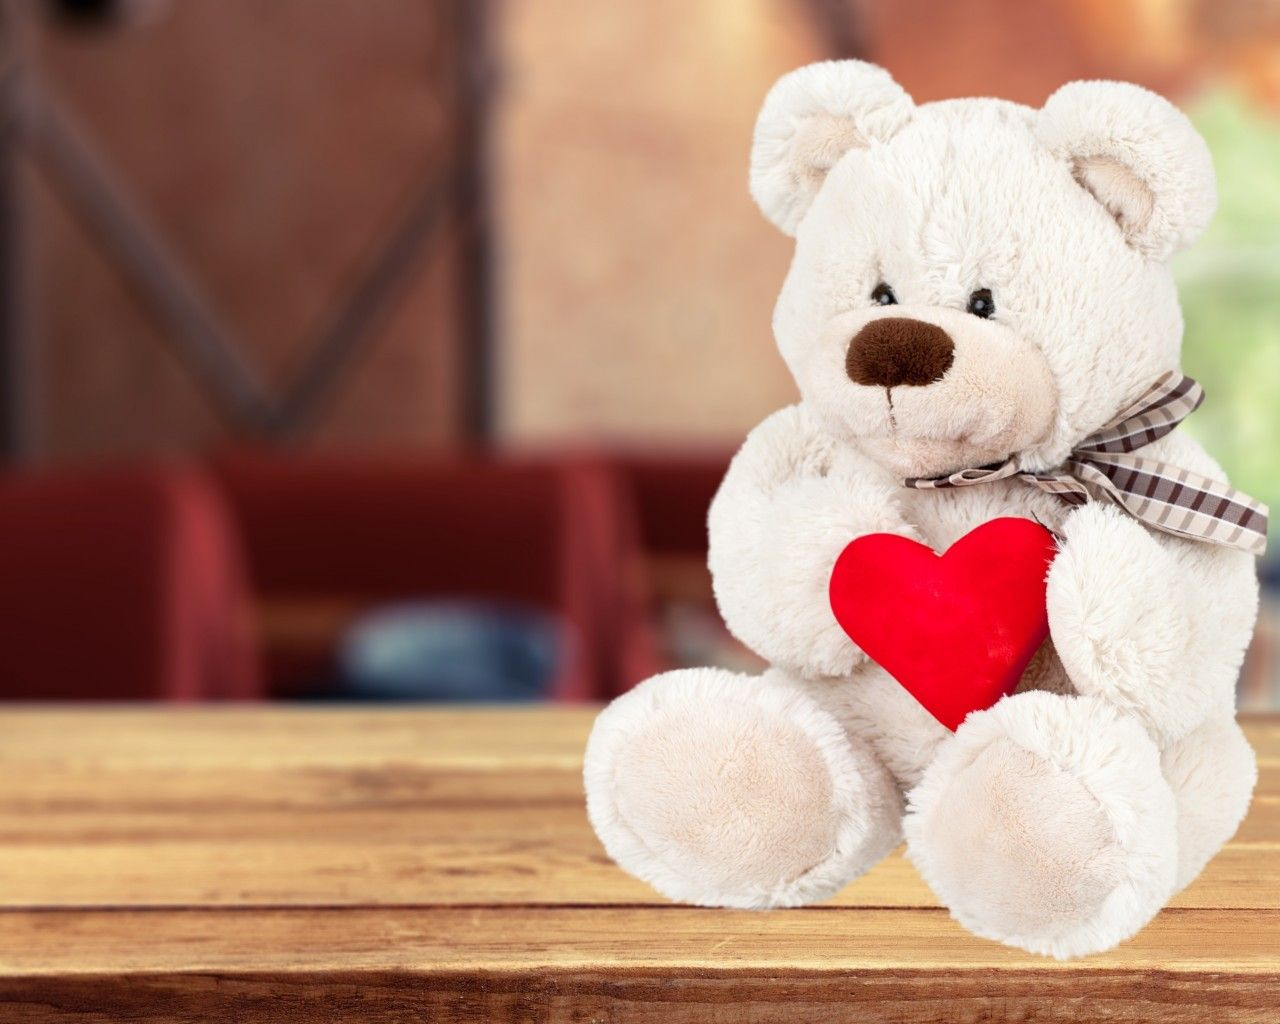 Download wallpaper love romantic sweet heart teddy bear toy download wallpaper love romantic sweet heart teddy bear toy voltagebd Images